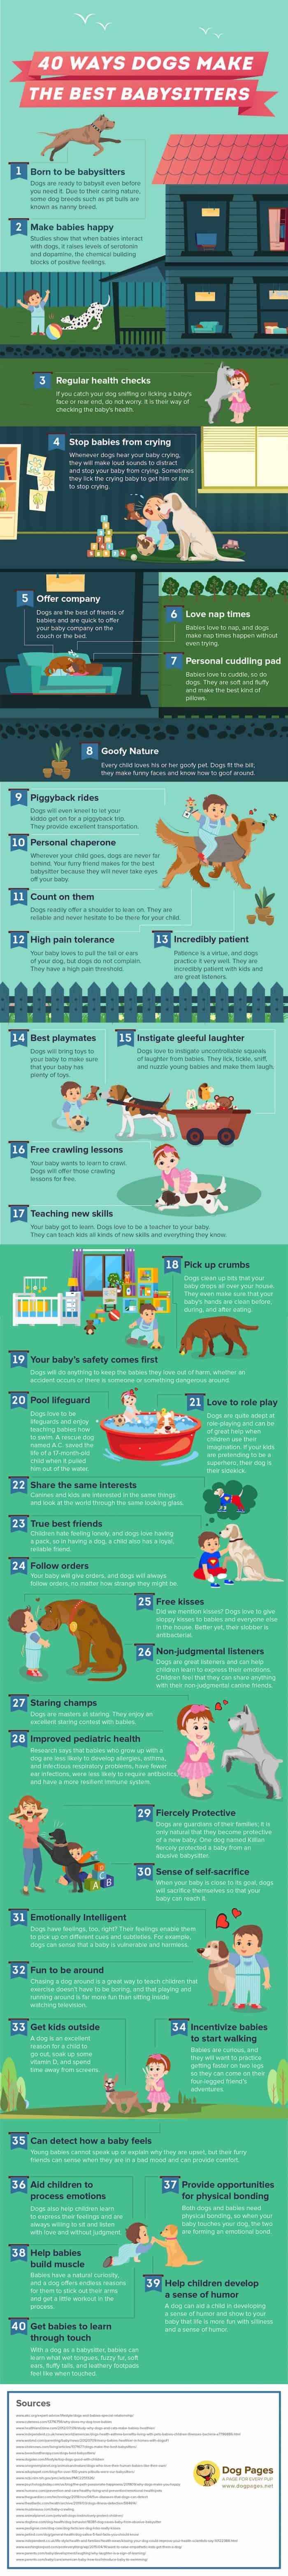 ways dogs accompany babies